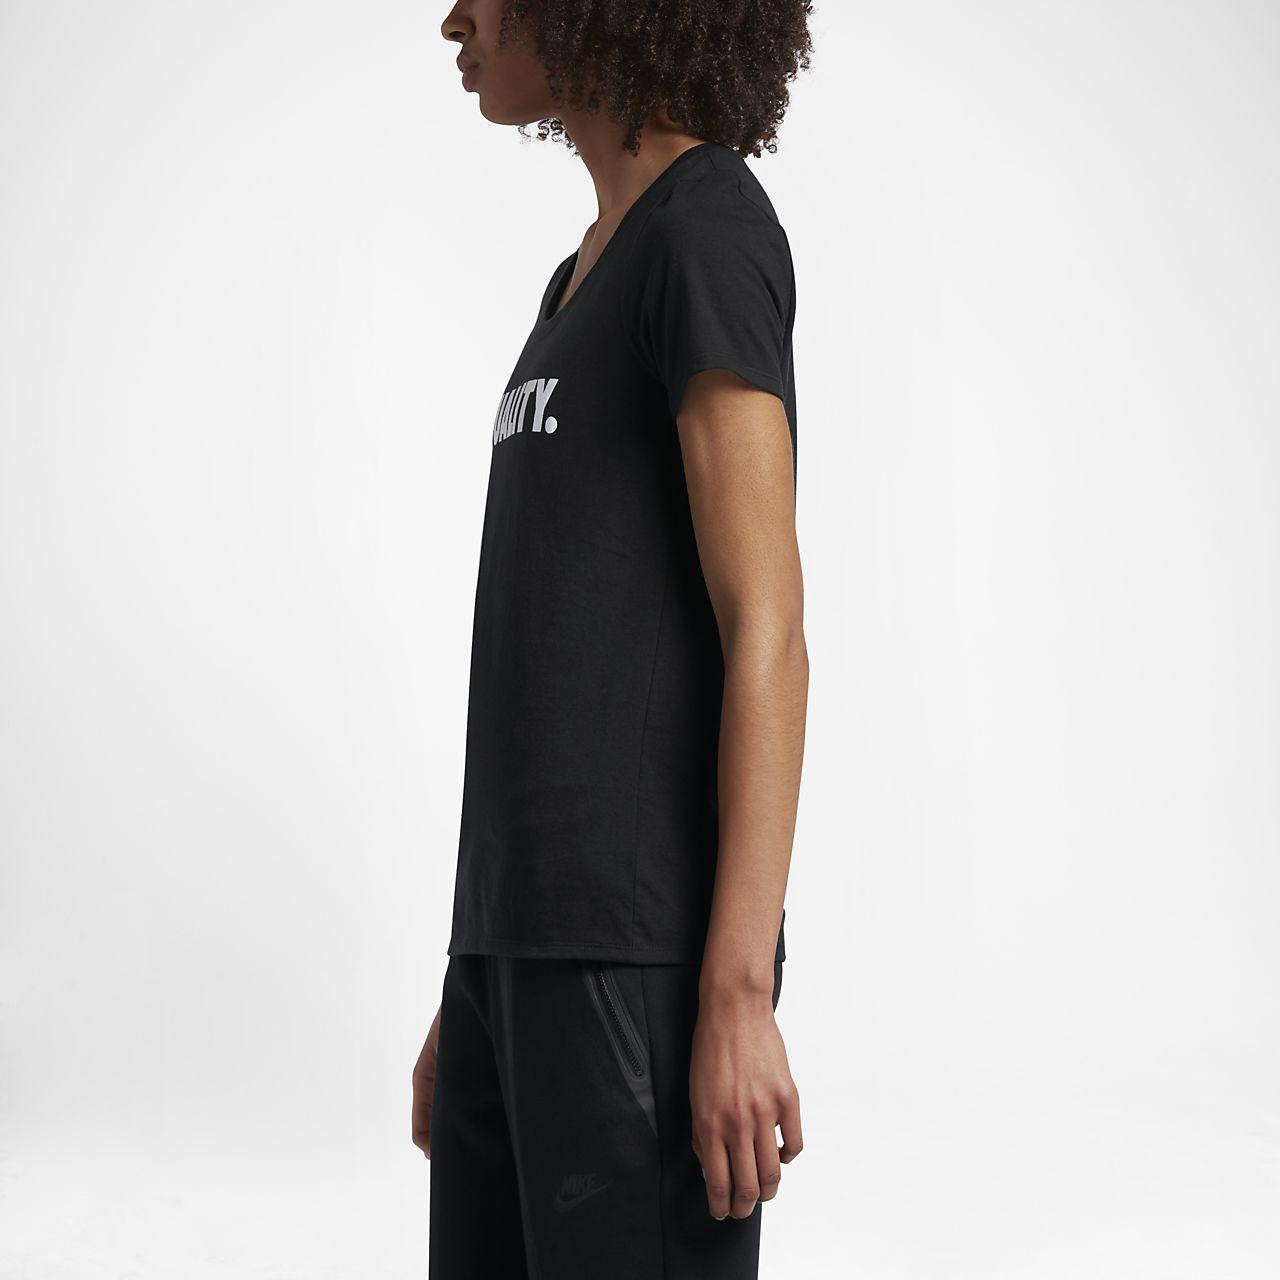 tee shirt nike equality pour femme ca. Black Bedroom Furniture Sets. Home Design Ideas